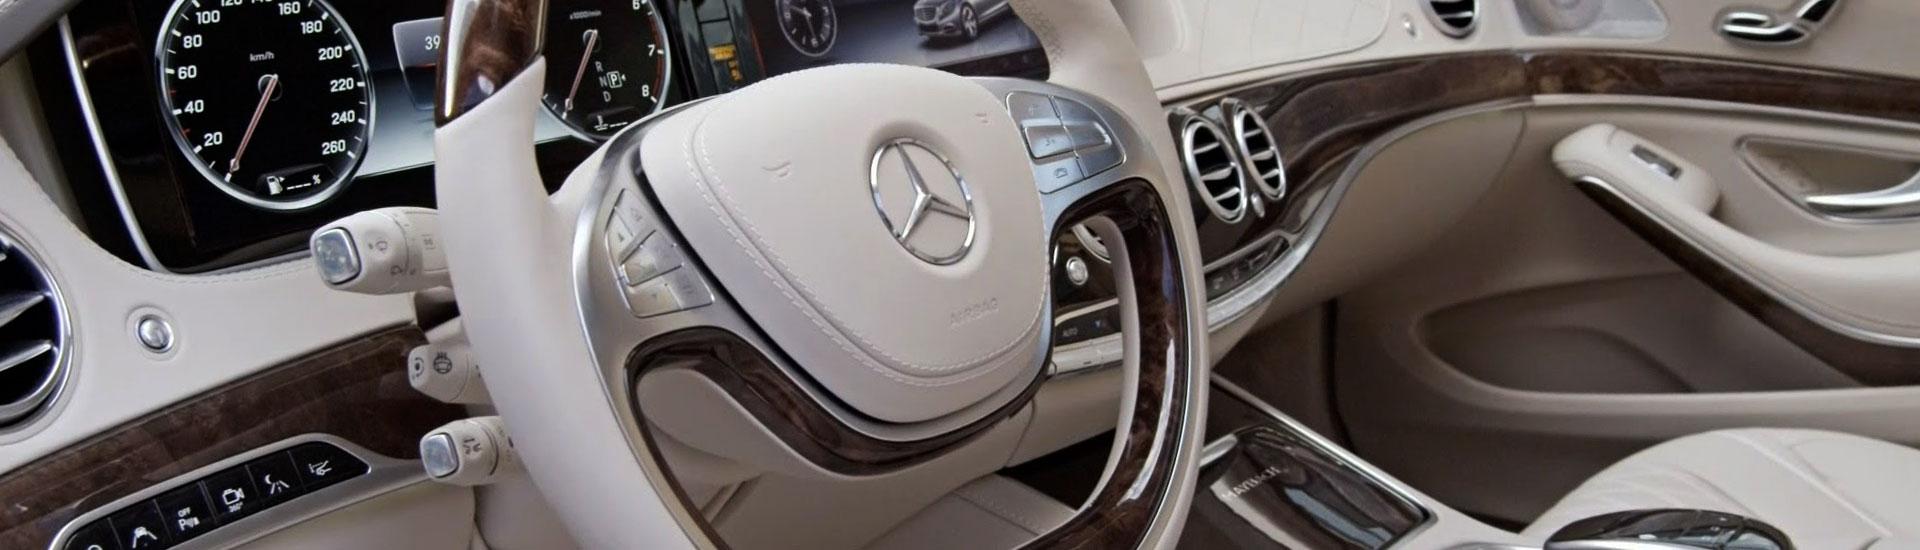 Mercedes-Benz Dash Kits   Custom Mercedes-Benz Dash Kit